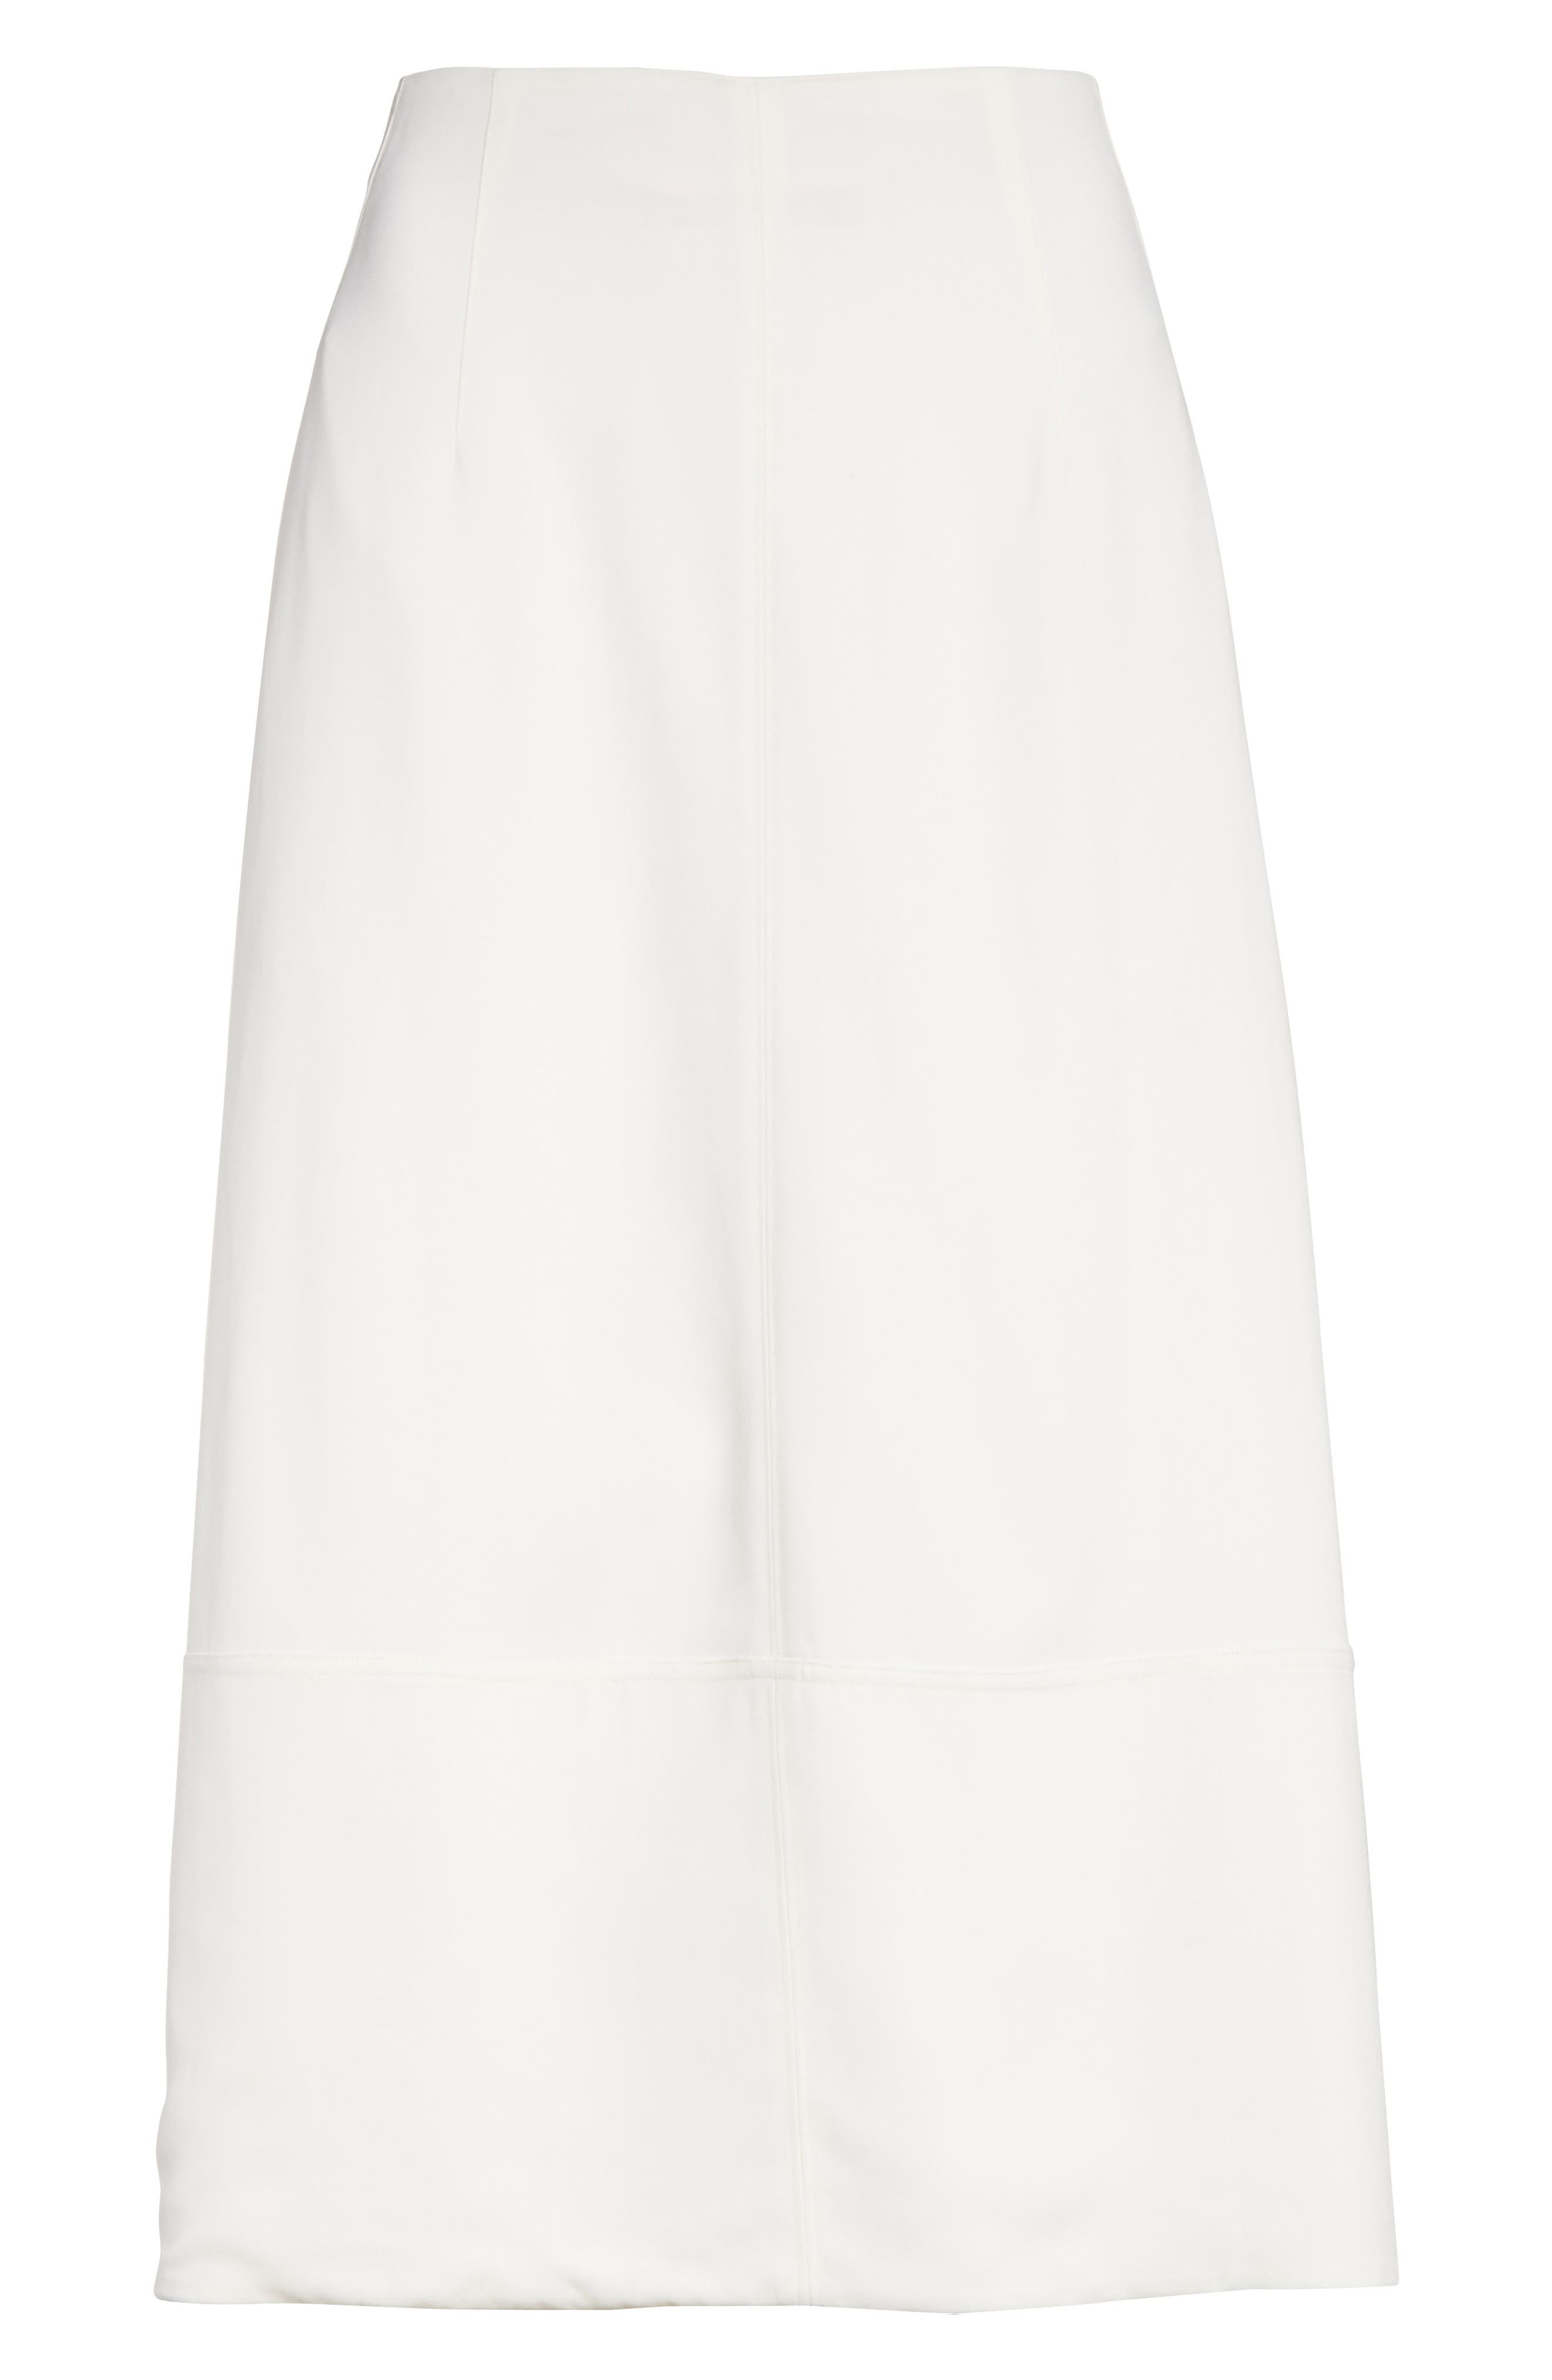 Lottie A-Line Midi Skirt,                             Alternate thumbnail 6, color,                             903